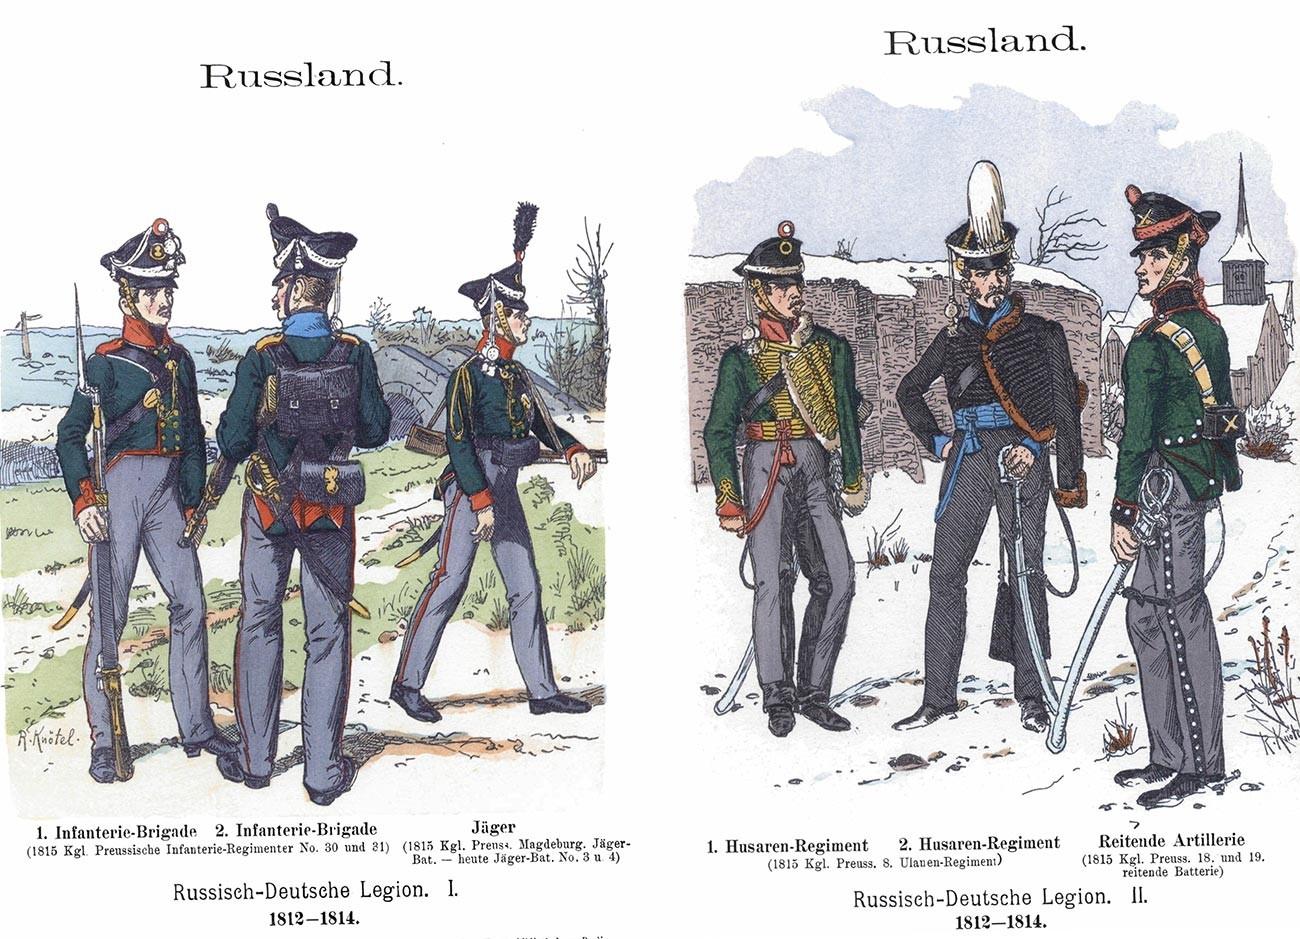 The Russian-German Legion.